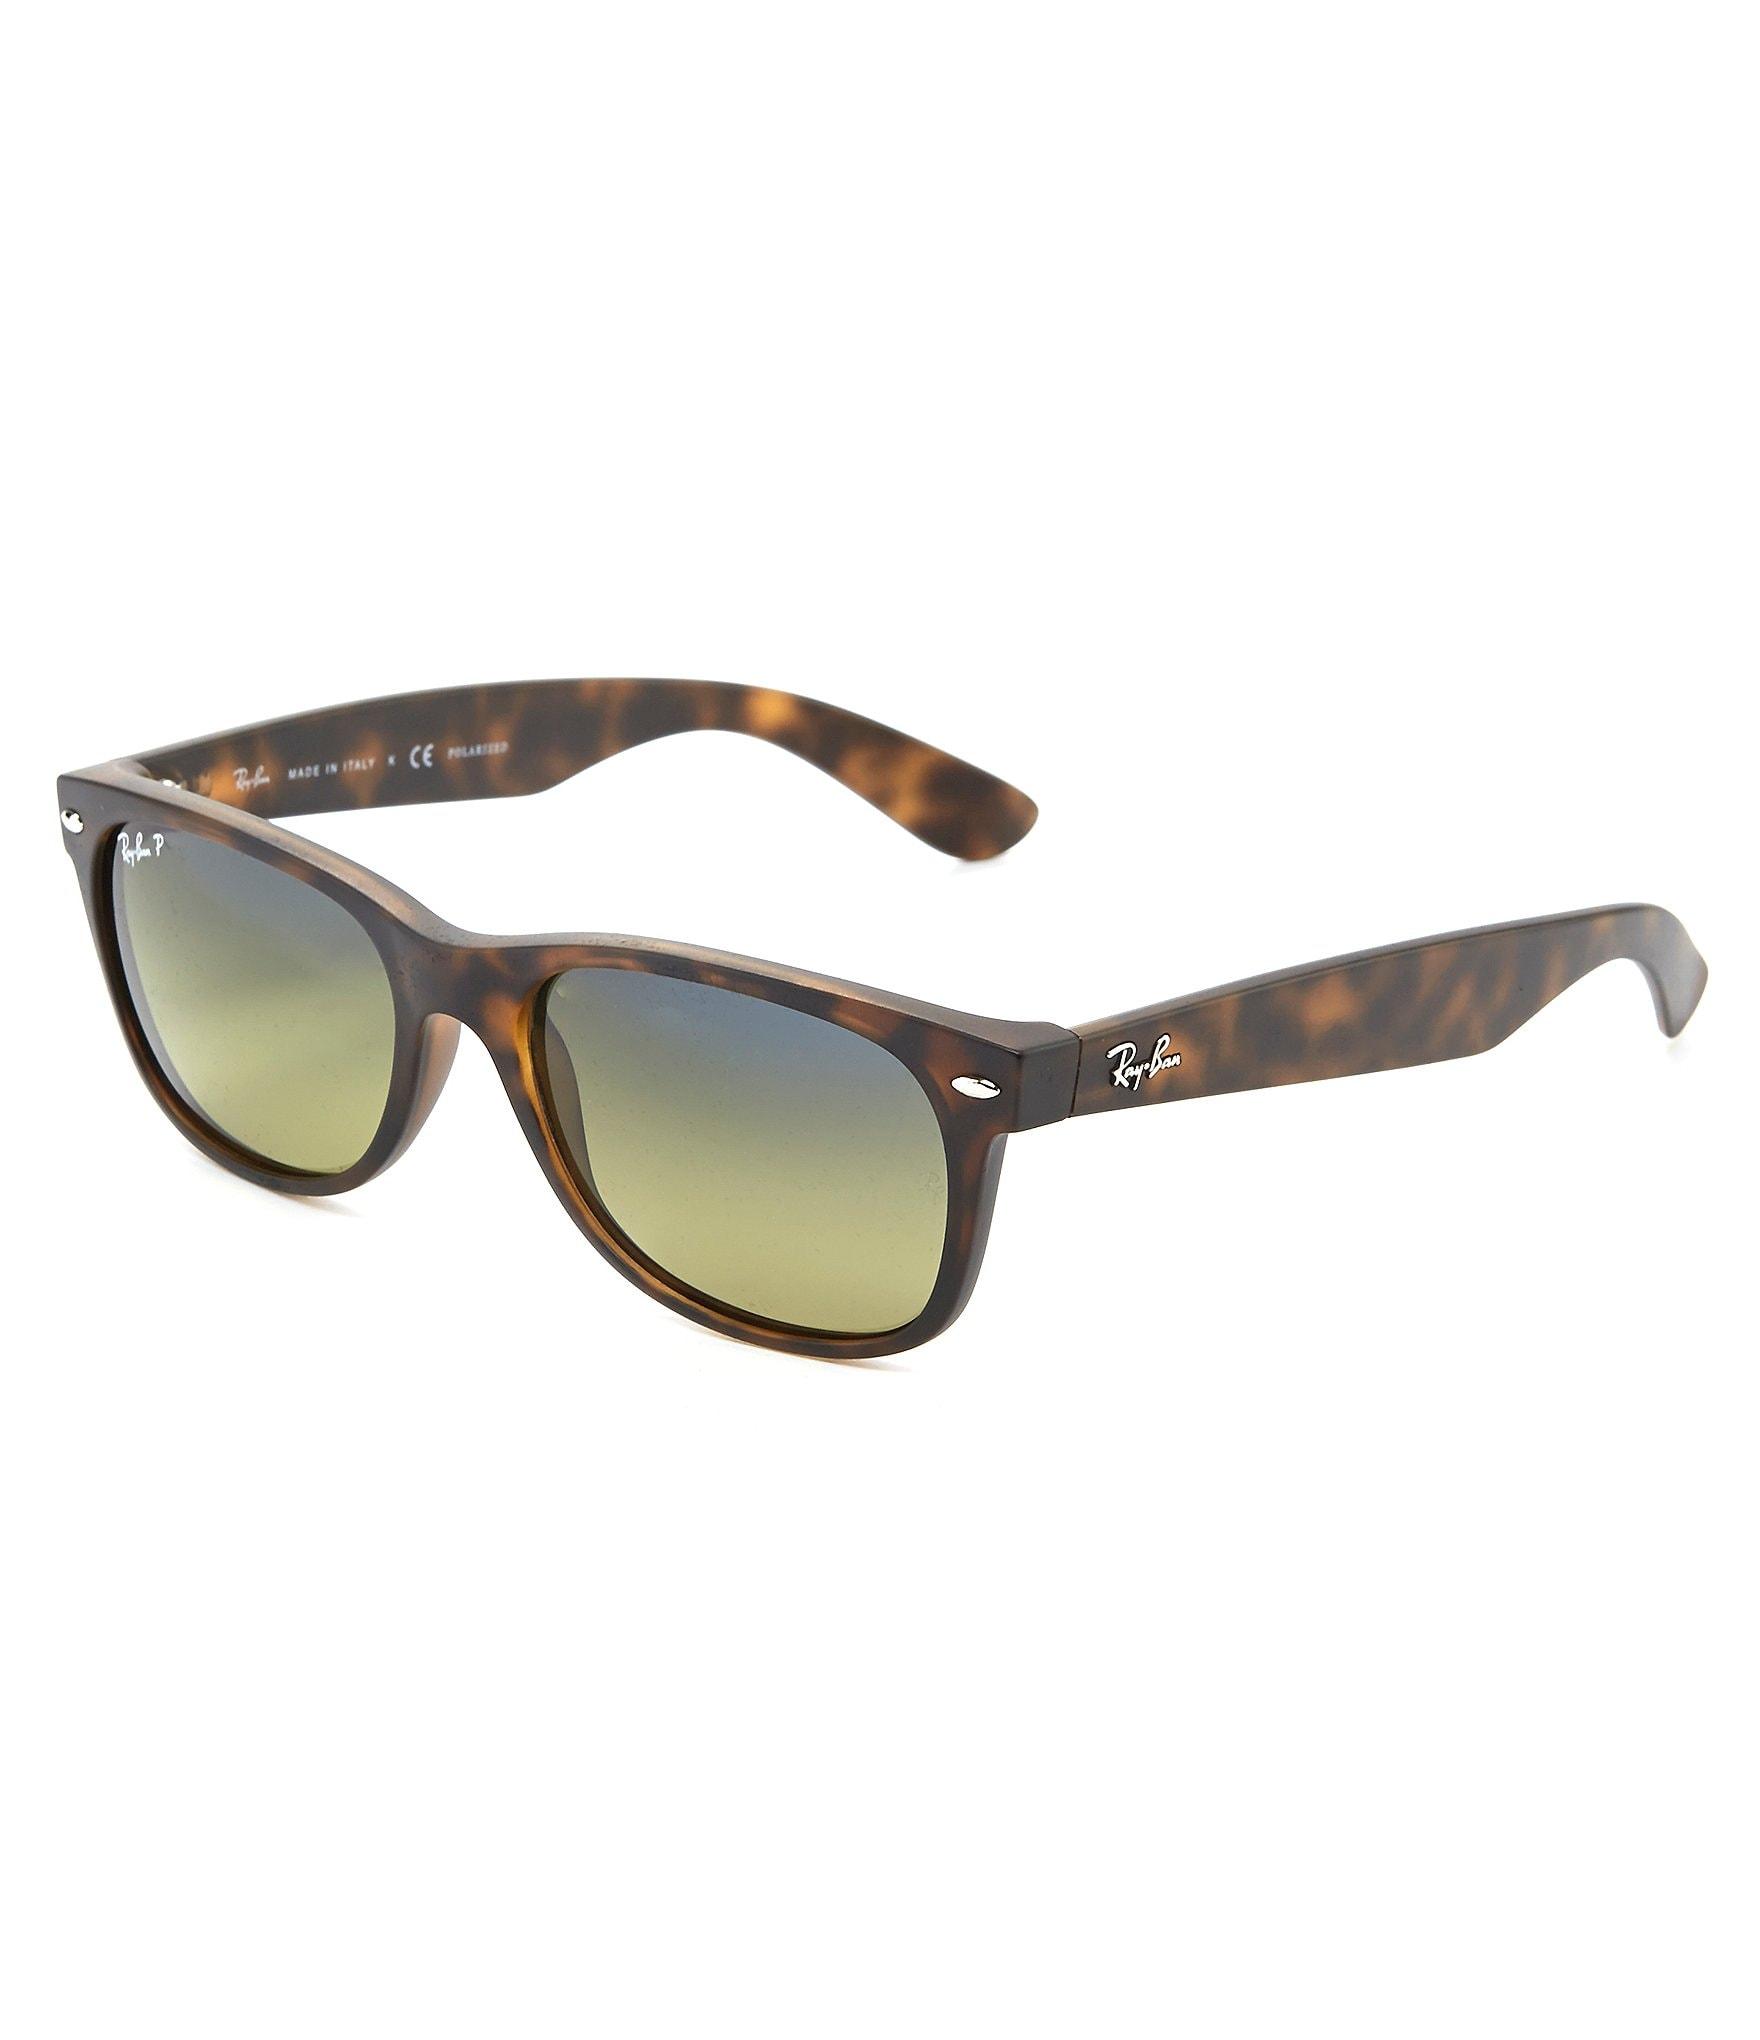 e6909d92c1d Ray-Ban Men s Sunglasses   Eyewear